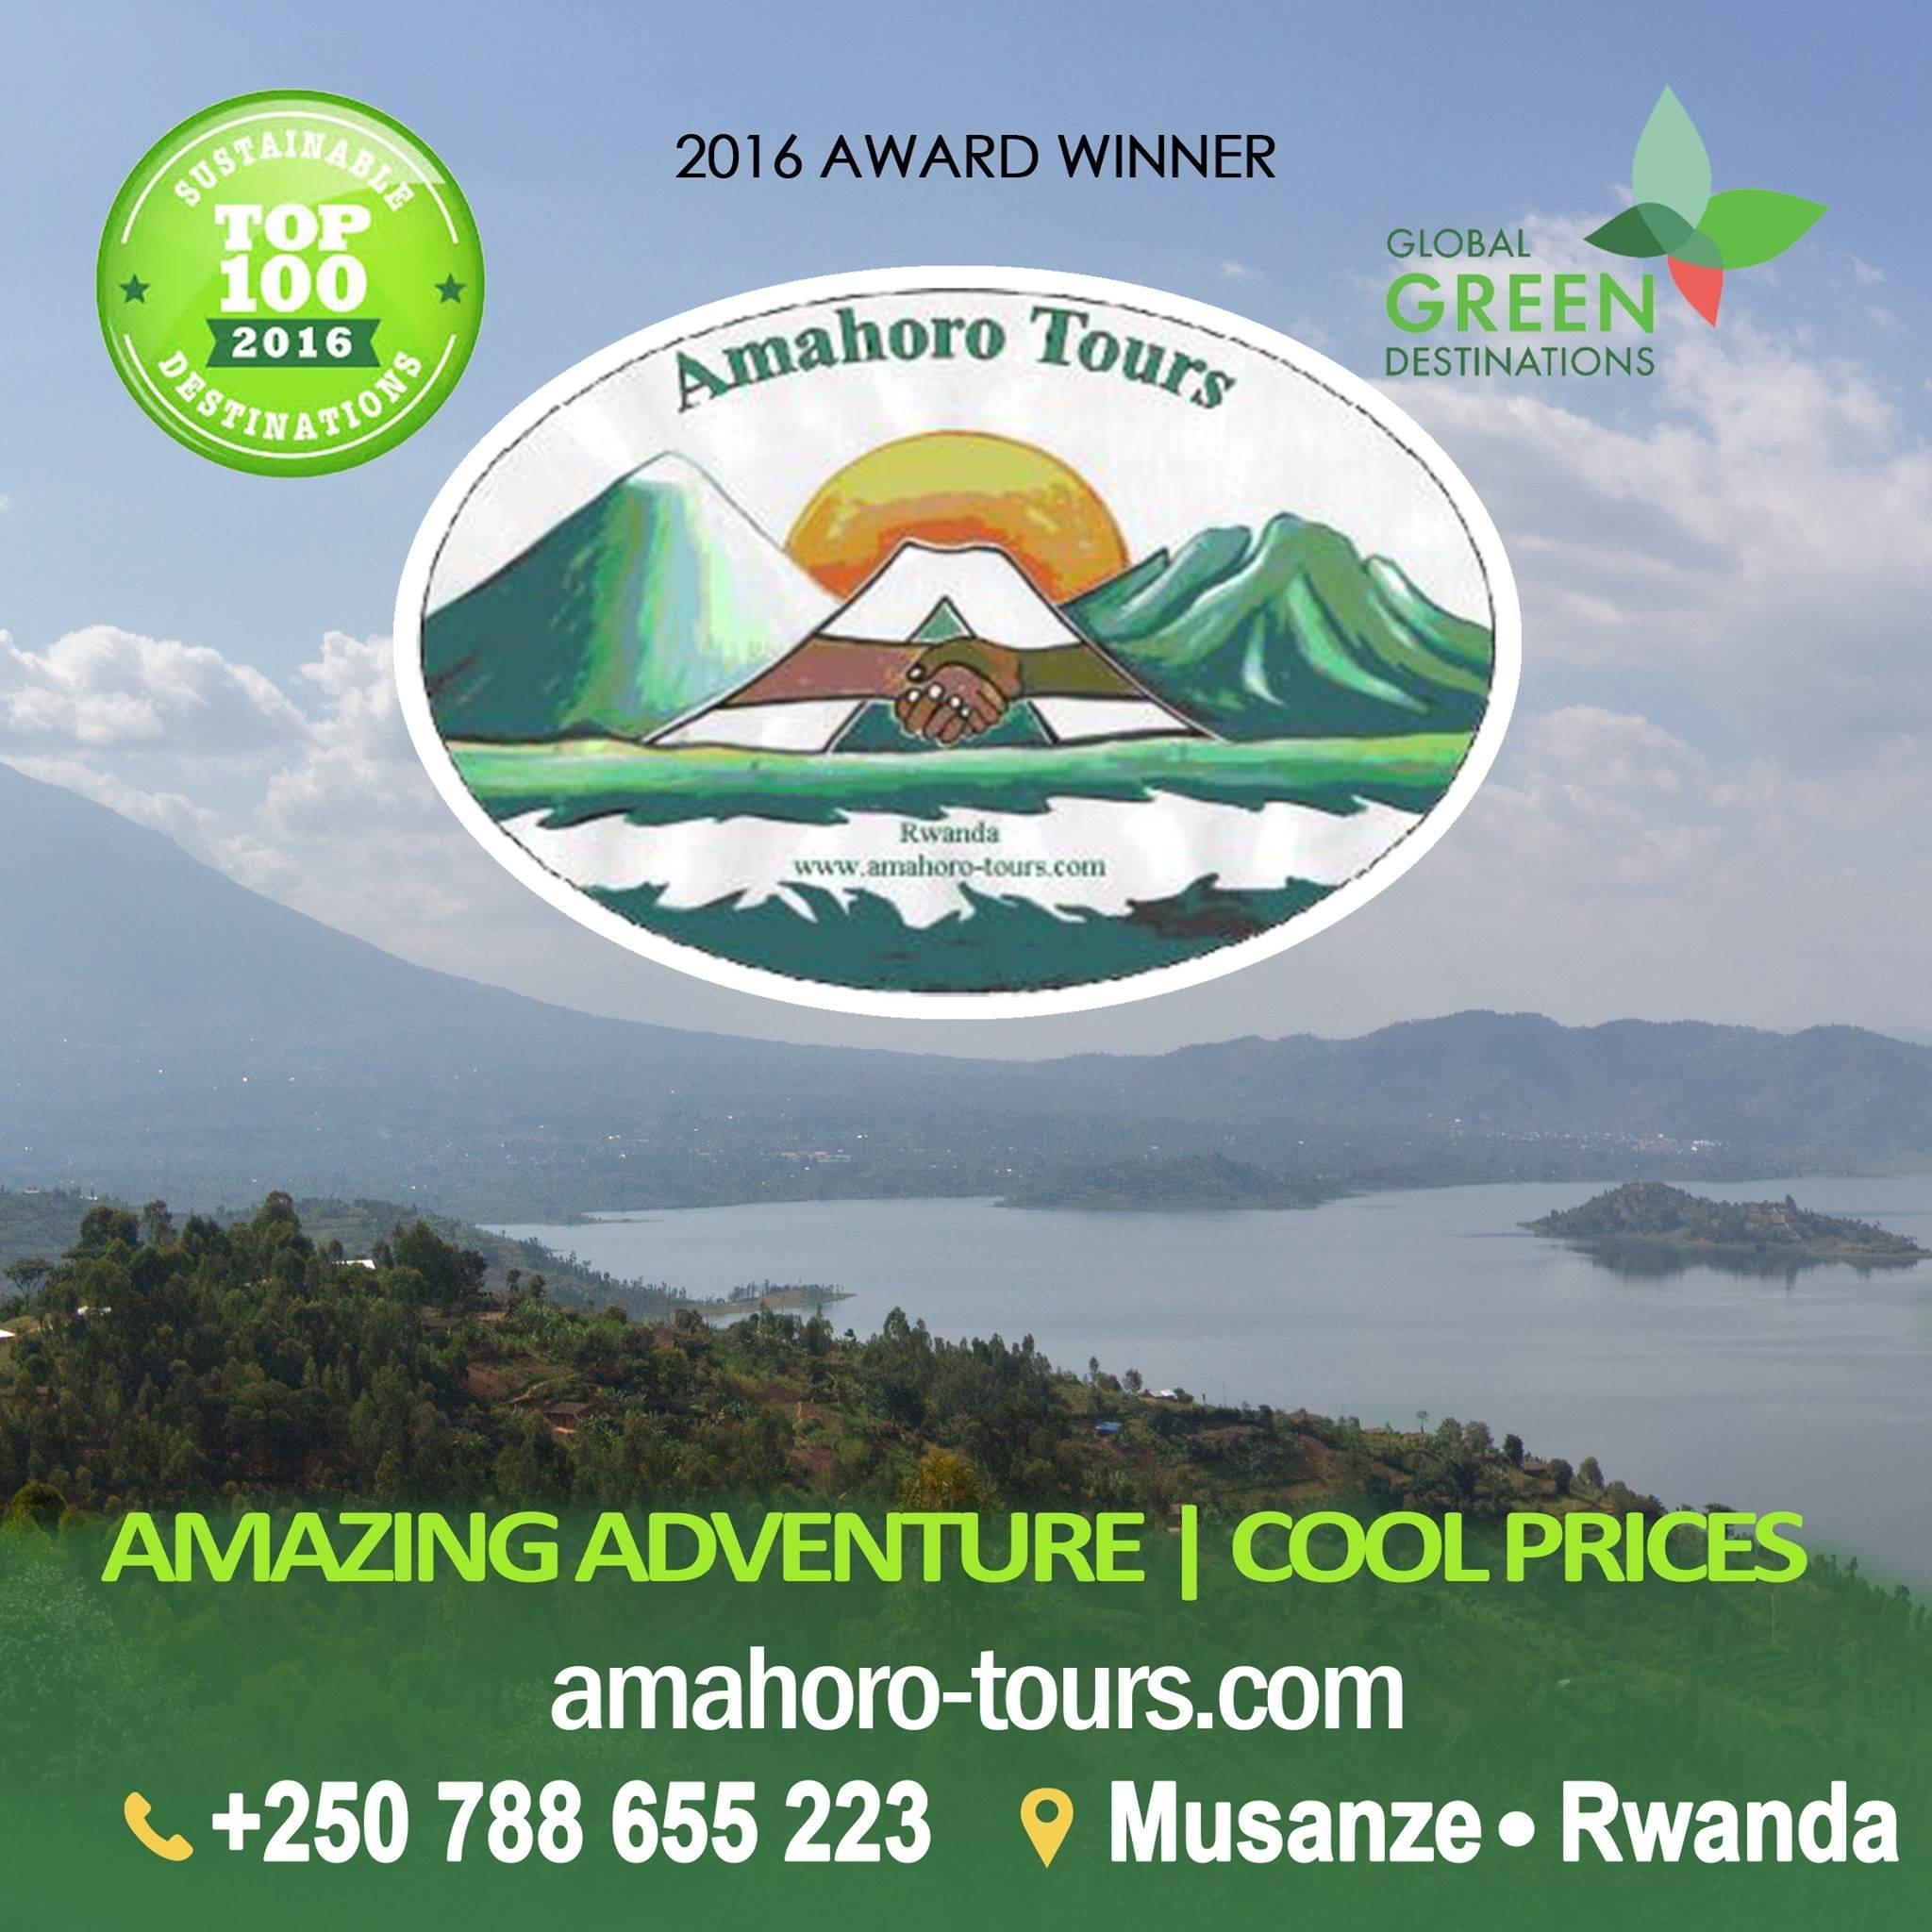 Amahoro Tours Responsible Tourism & Eco-Tourism in Rwanda, Uganda and the Democratic Republic of Congo